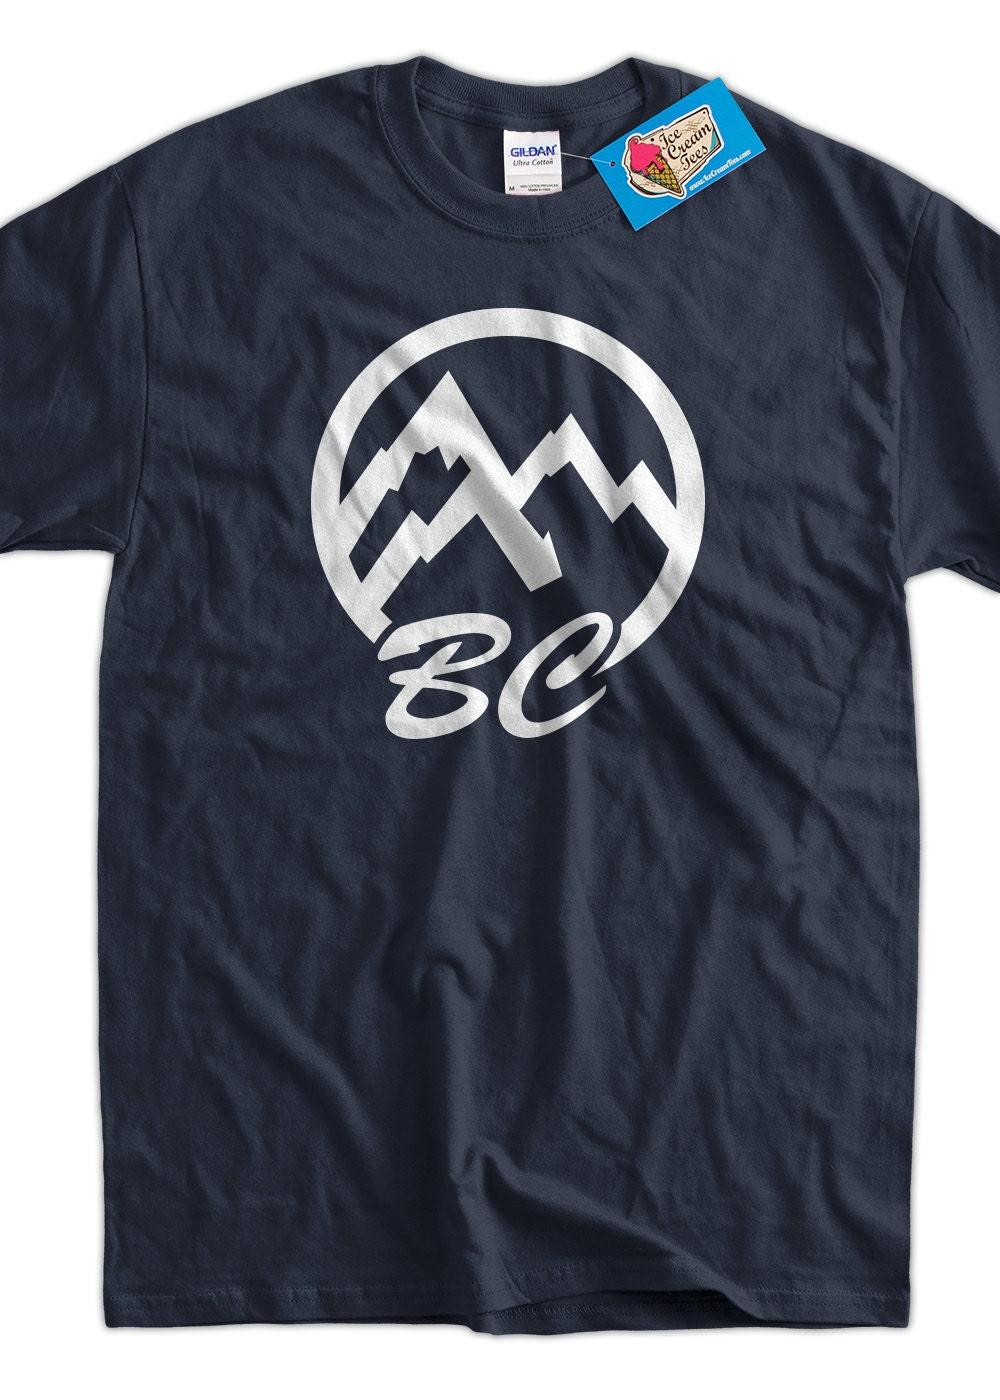 Bc british columbia canada t shirt screen printed tee shirt for Where to screen print shirts